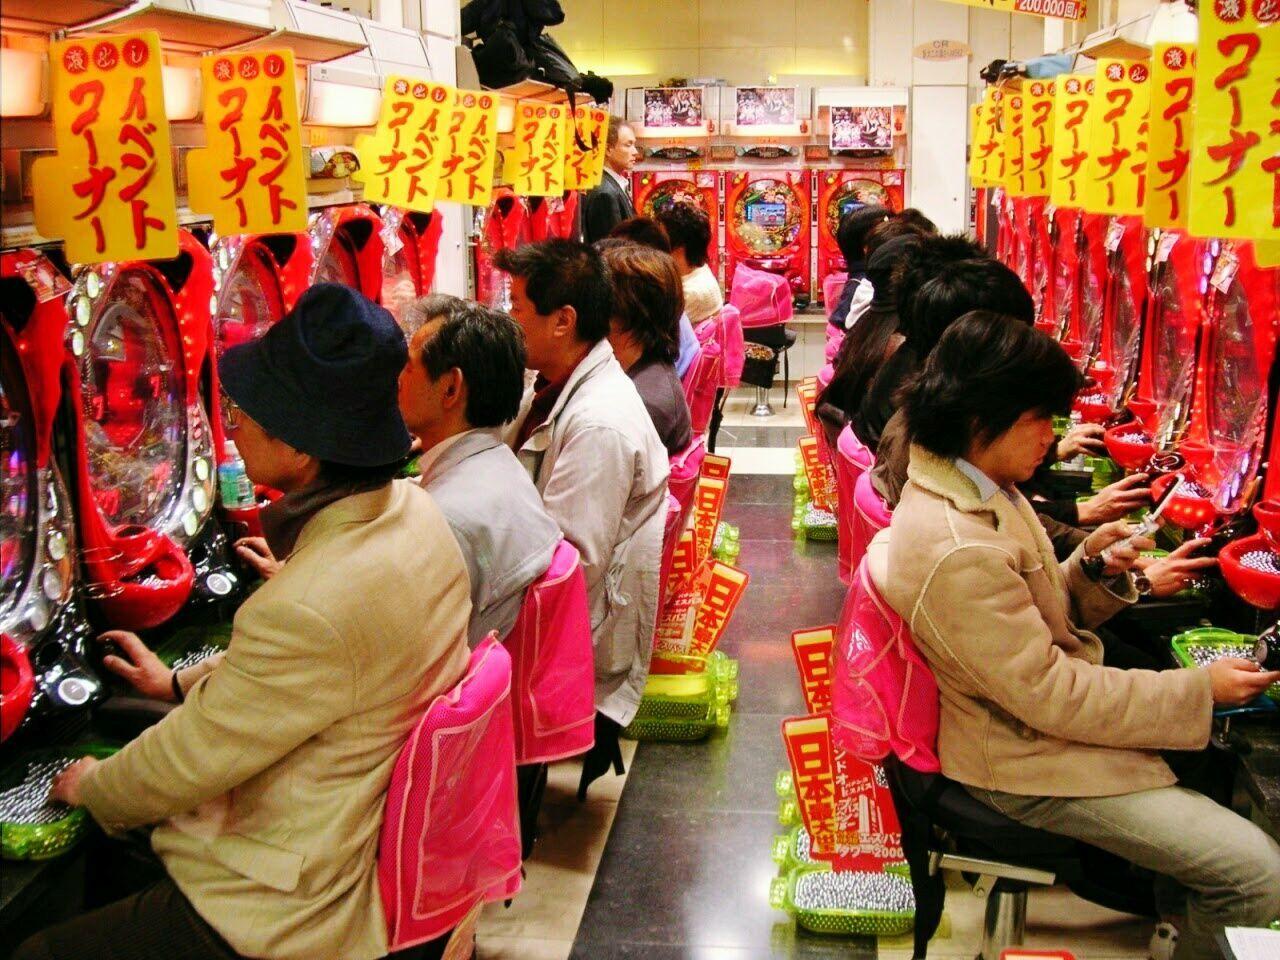 Pachinko parlor Pachinko In Japan Pachinko Tokyo